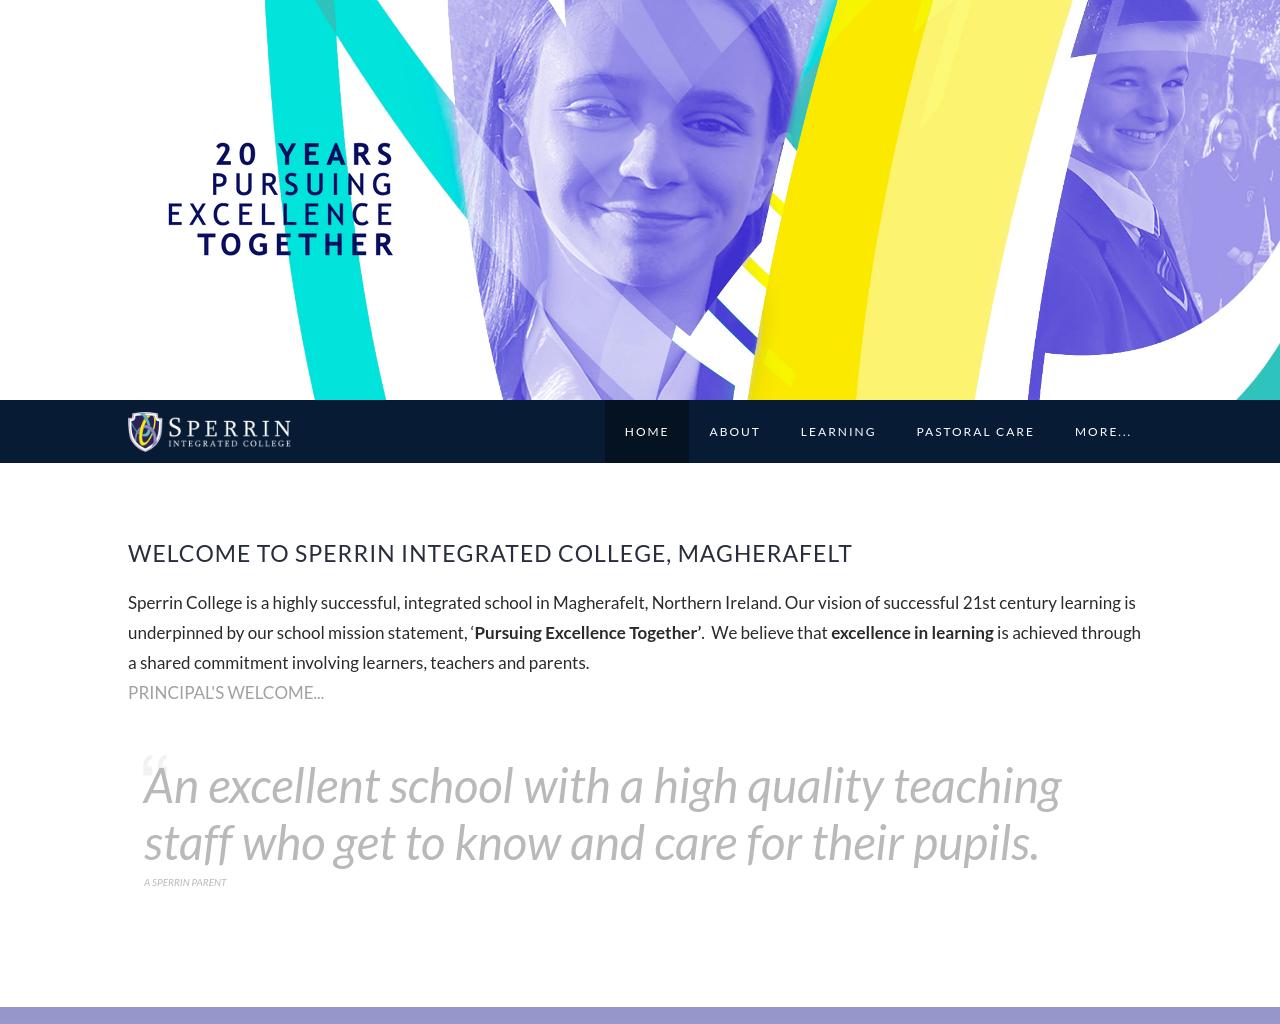 Sperrin Integrated College